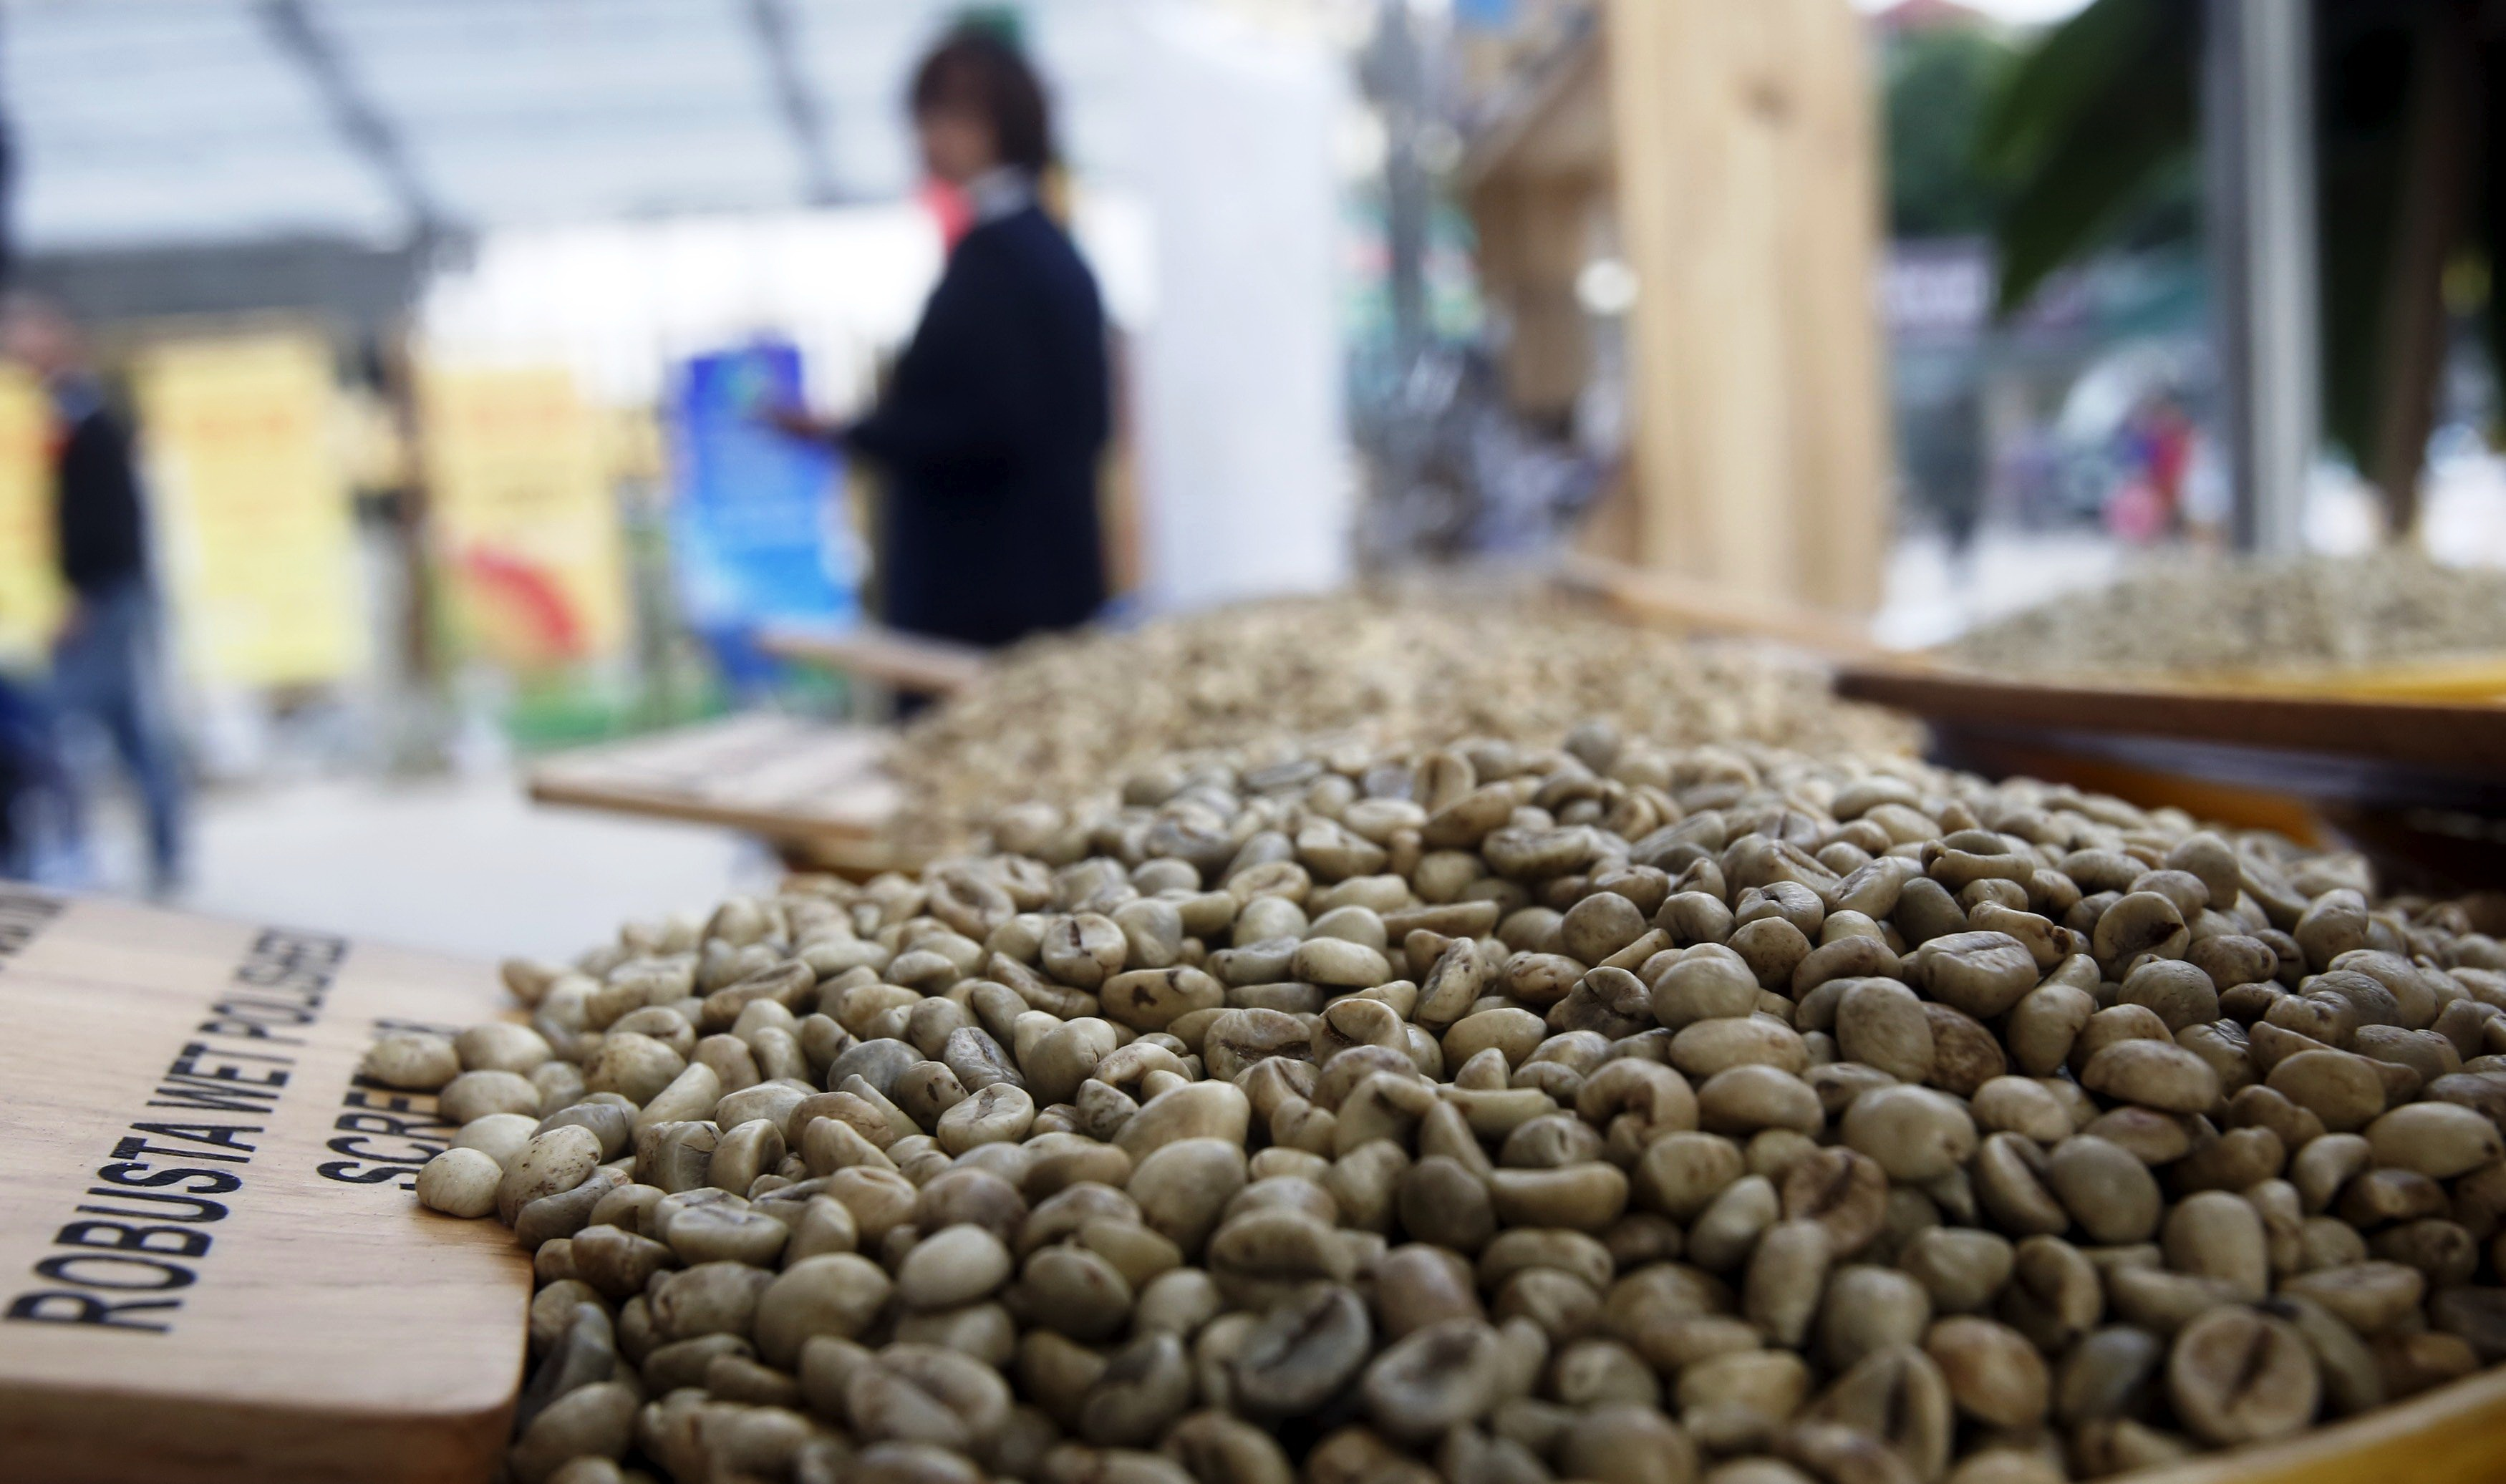 Softer loans won't quicken Vietnam coffee replanting